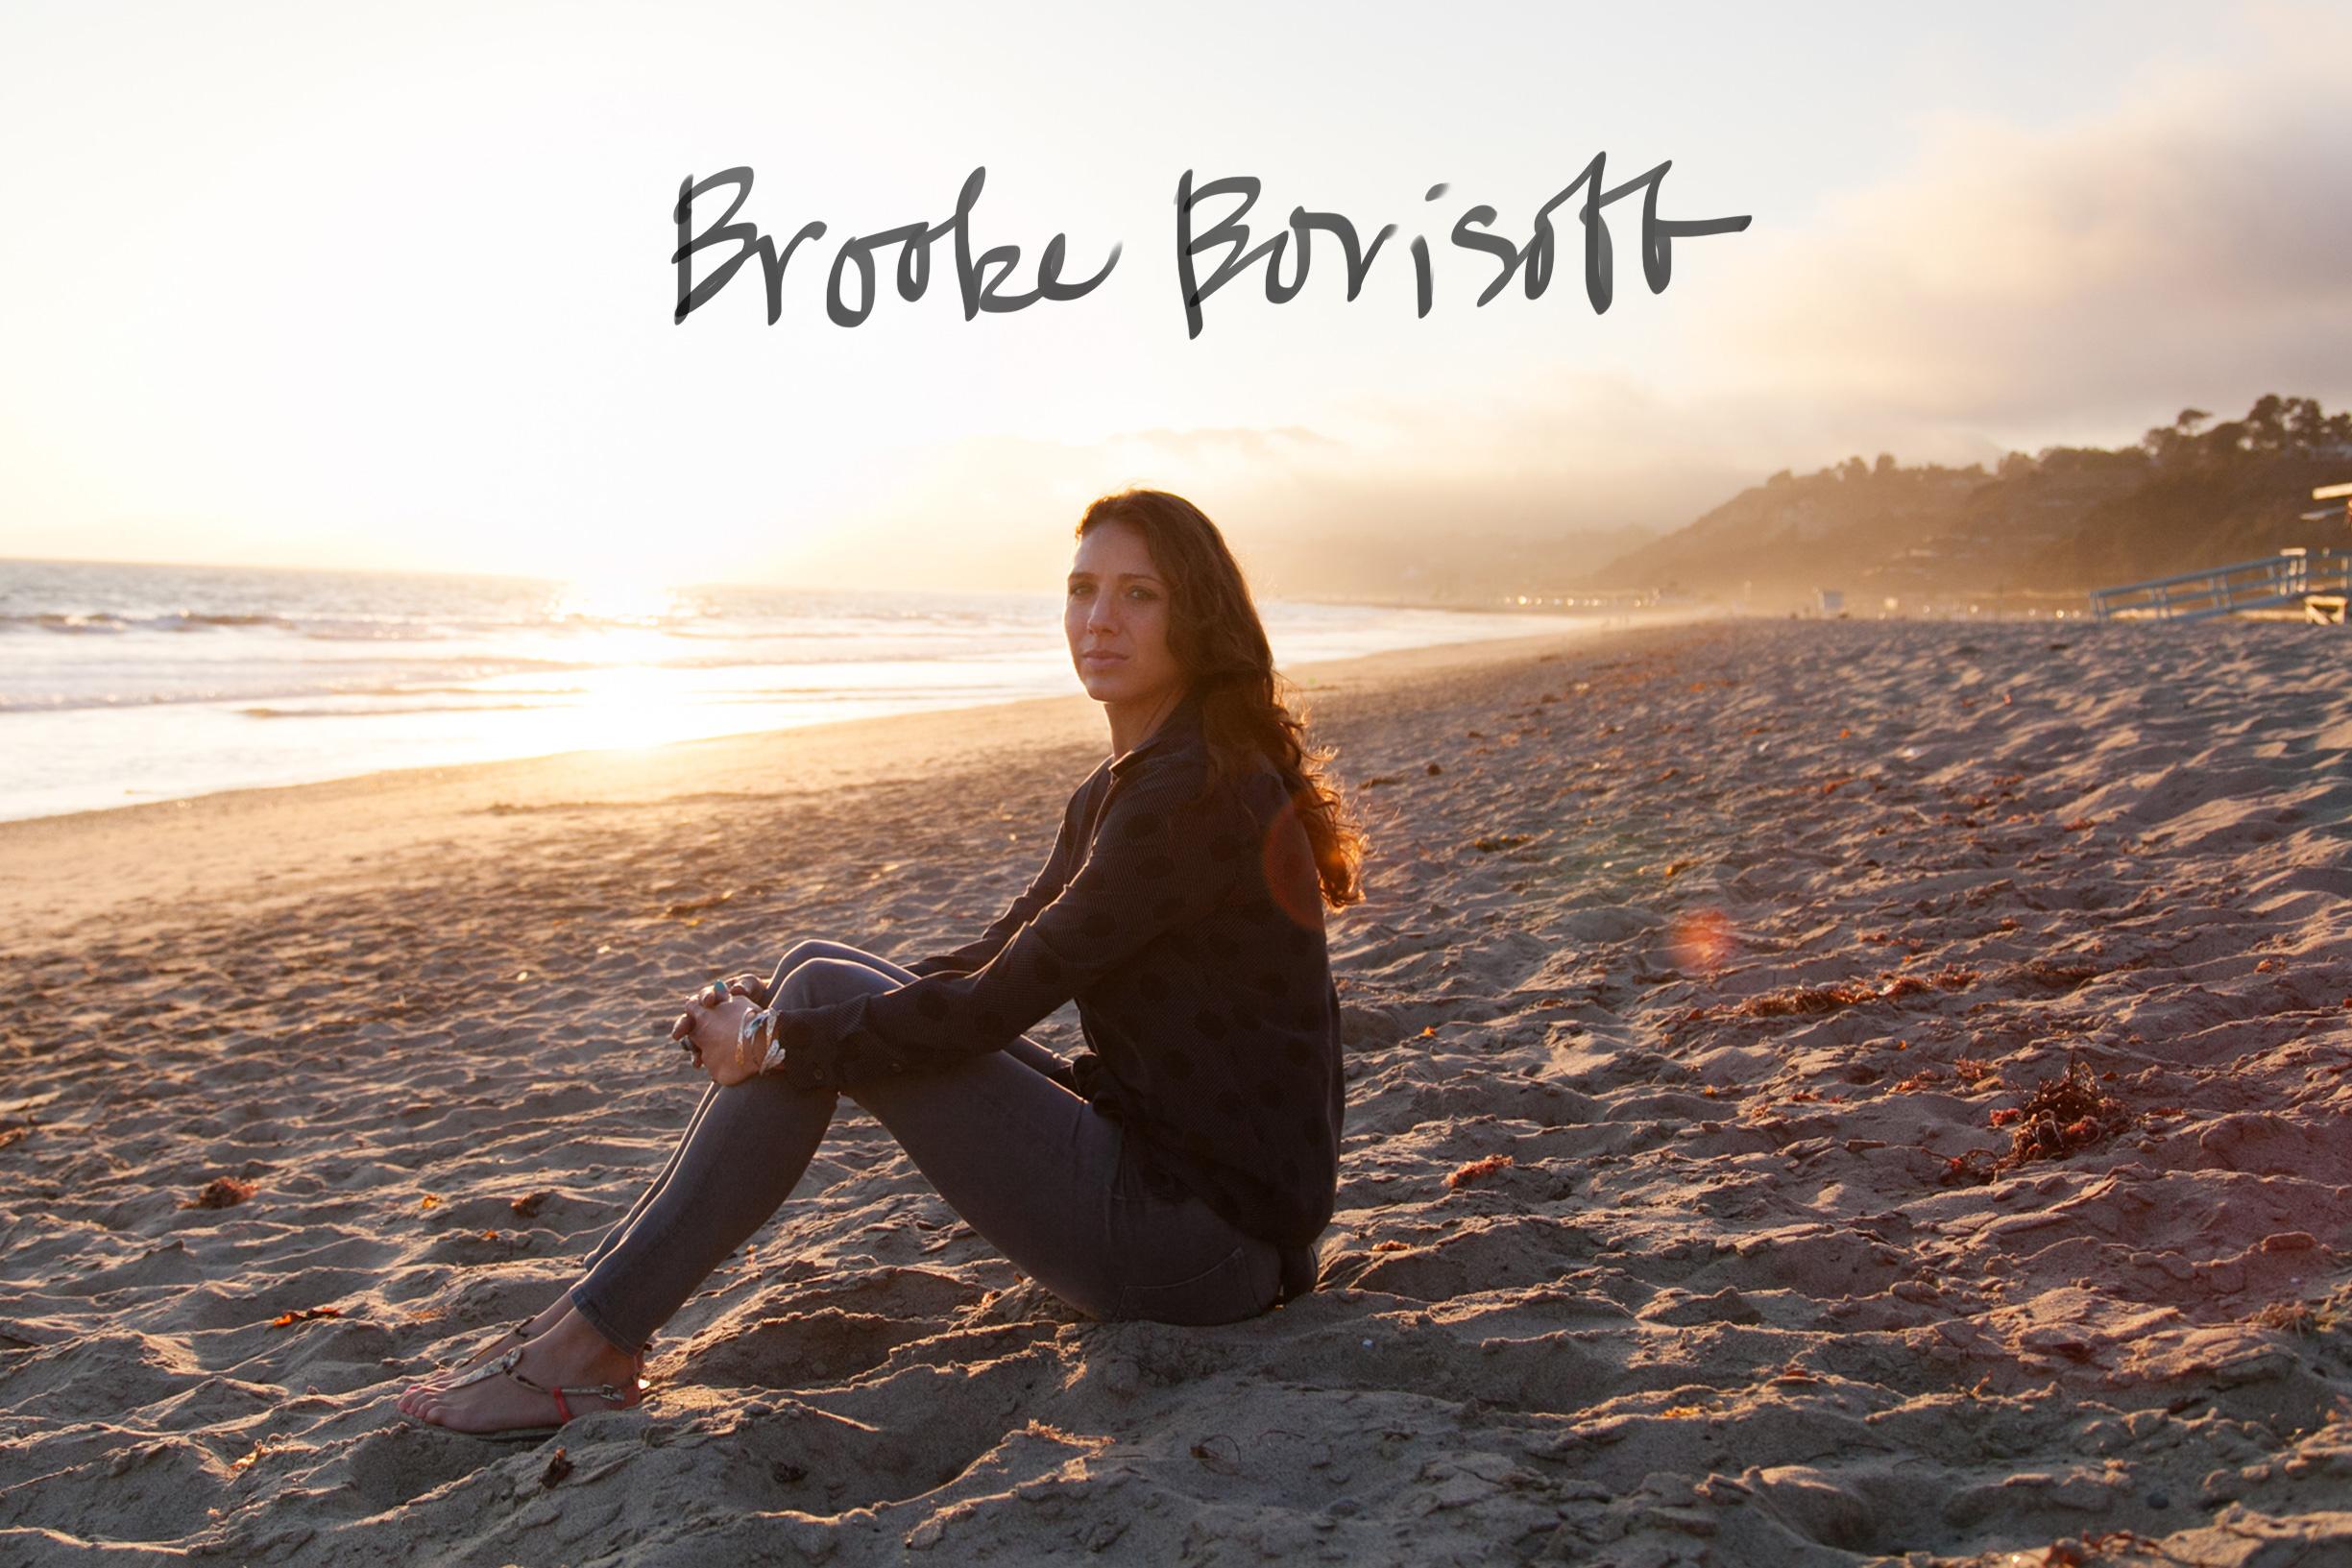 Brooke Borisoff on Smile Heart Love